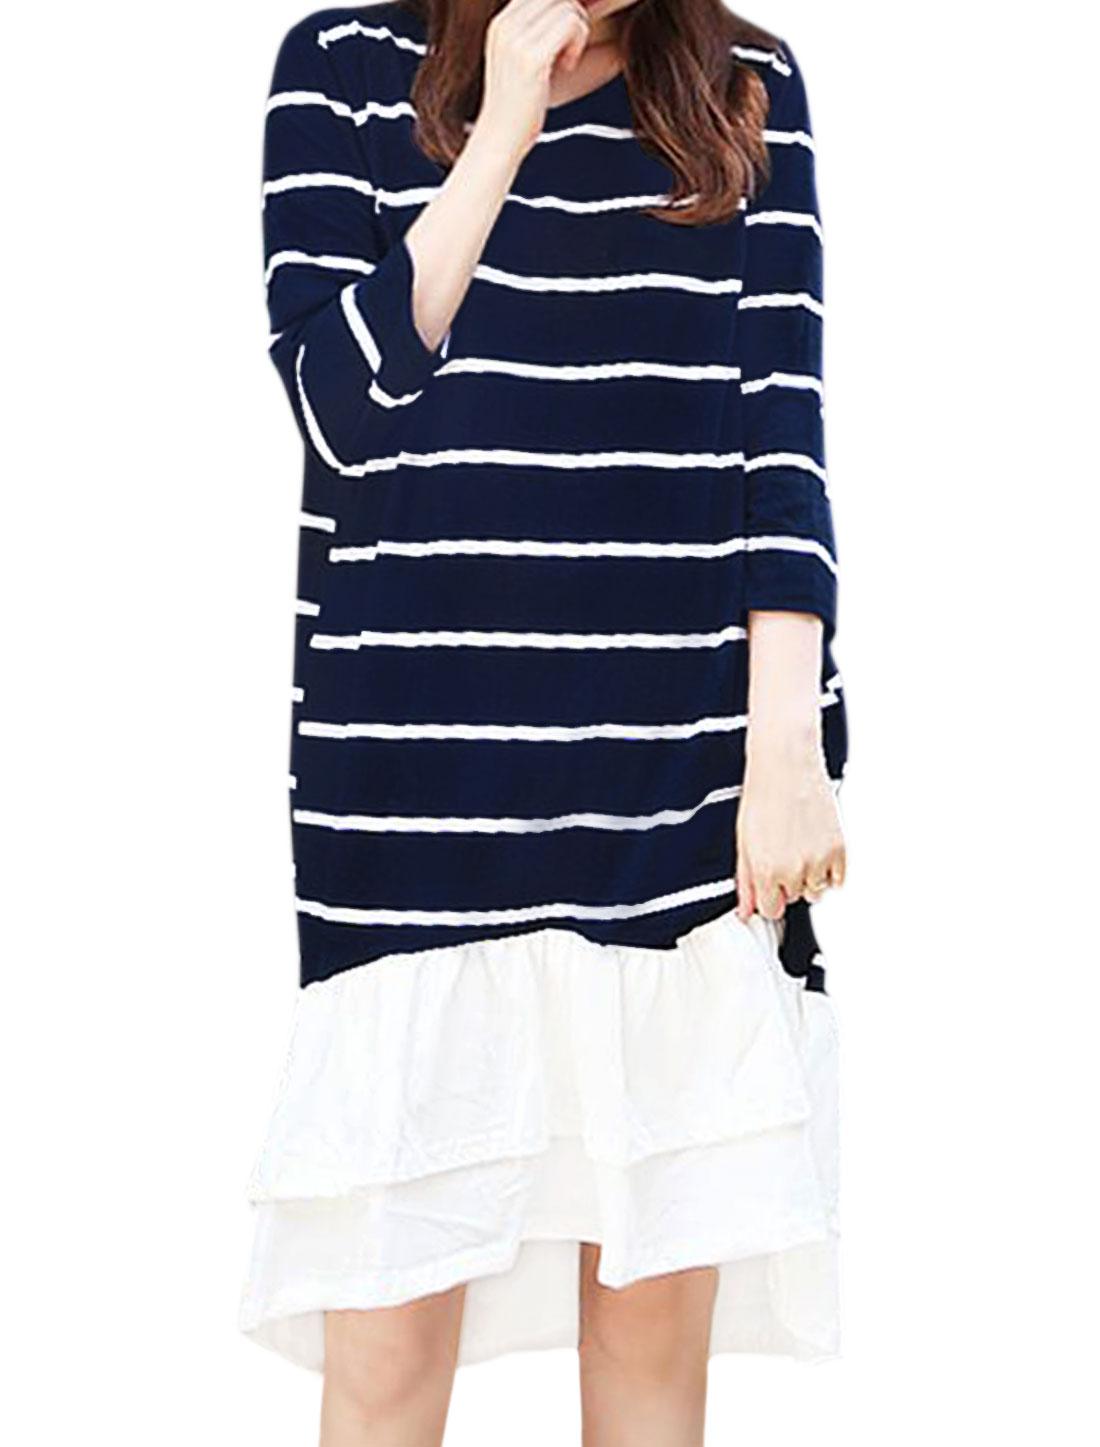 Women 3/4 Sleeves Paneled Flouncing Hem Layered Stripes Dress Blue XS